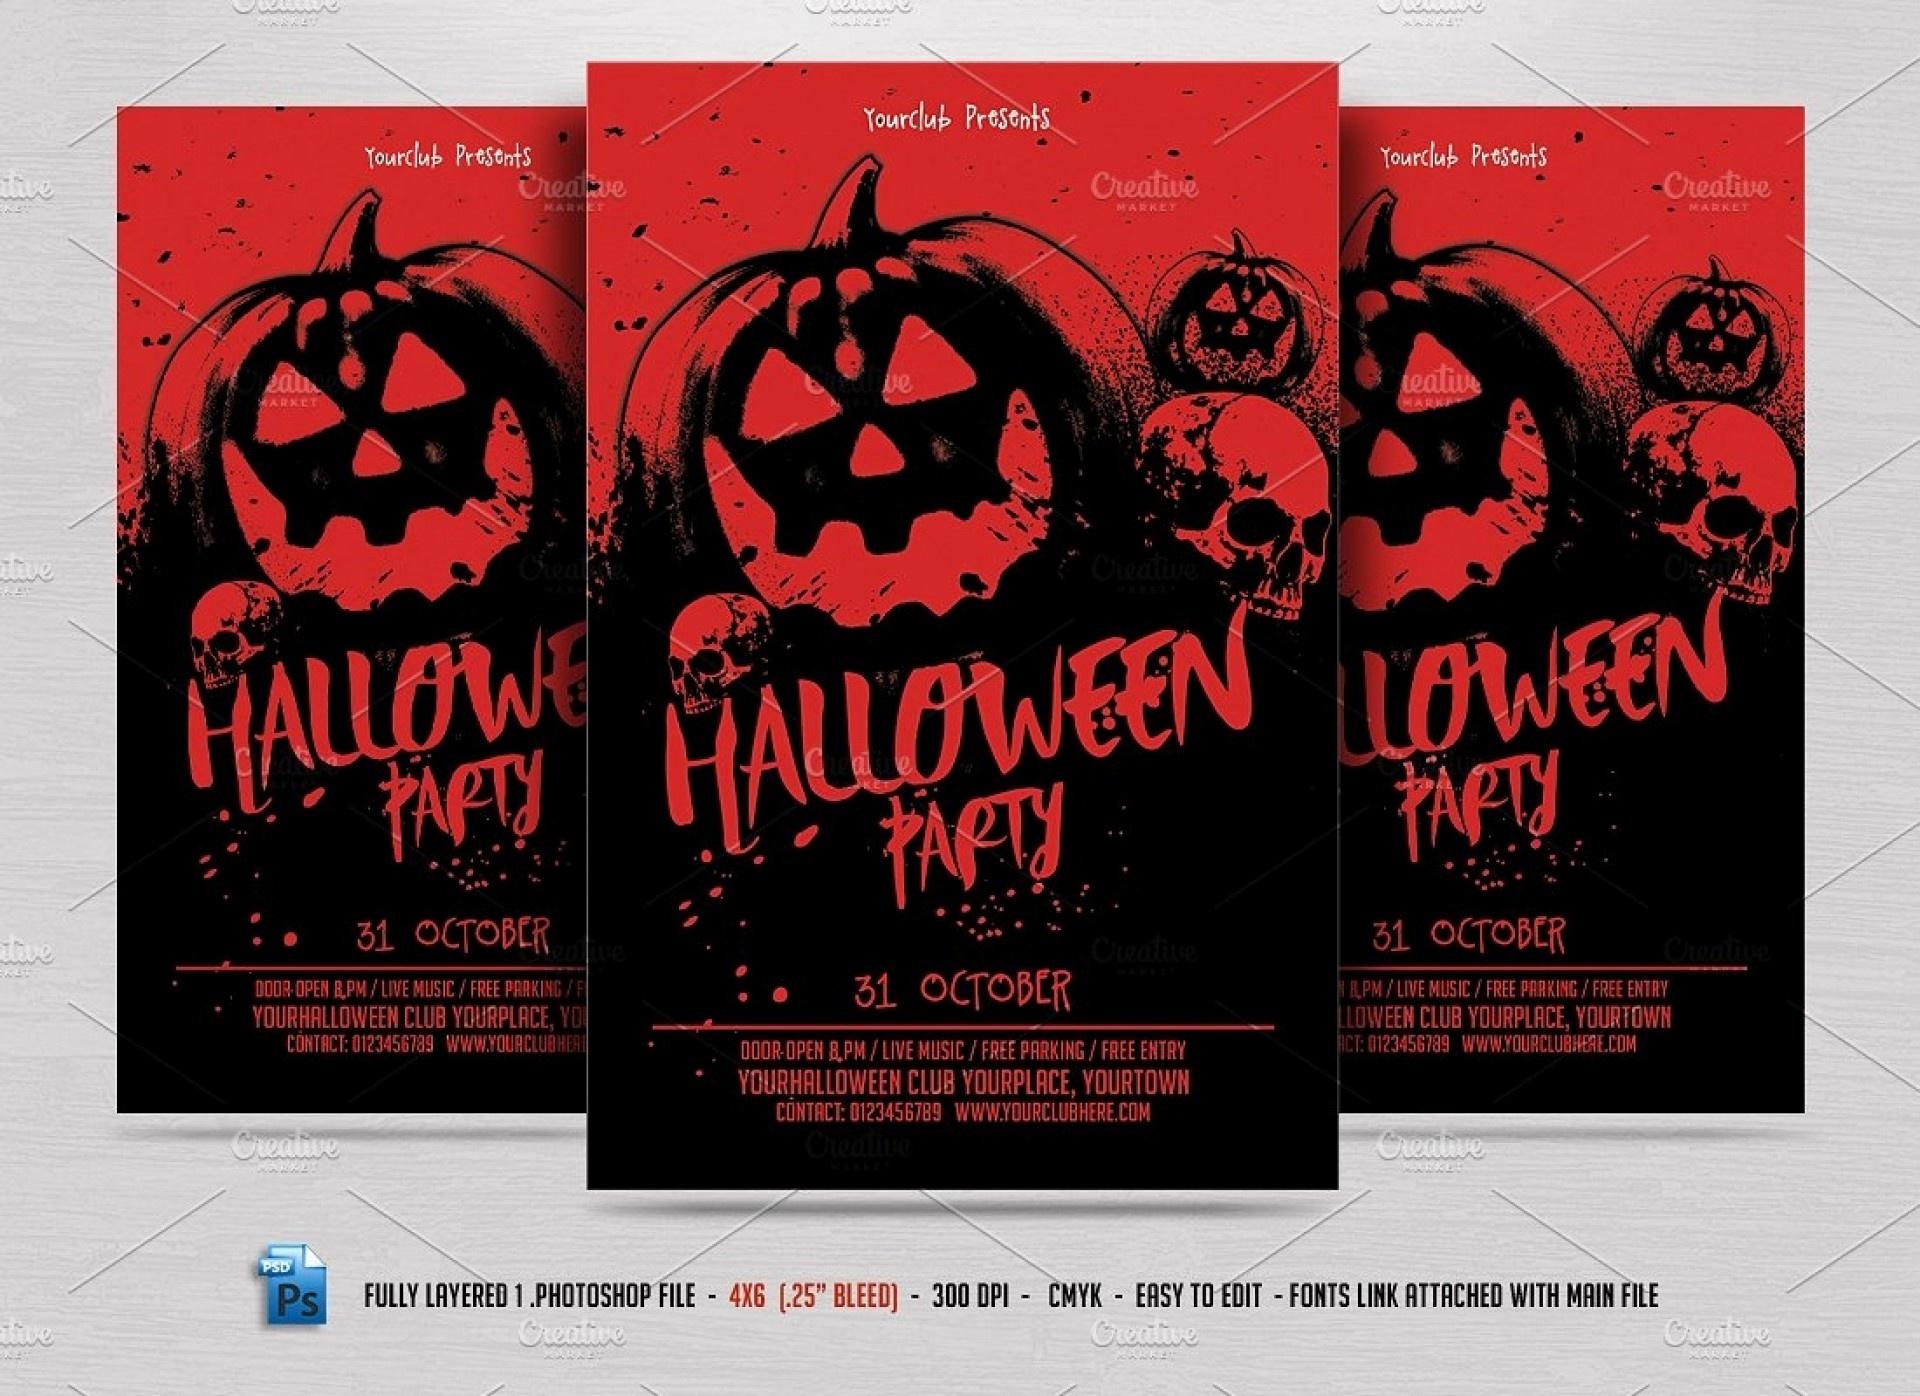 004 Template Ideas Free Halloween Flyers Wondrous Templates Editable - Free Printable Halloween Flyer Templates